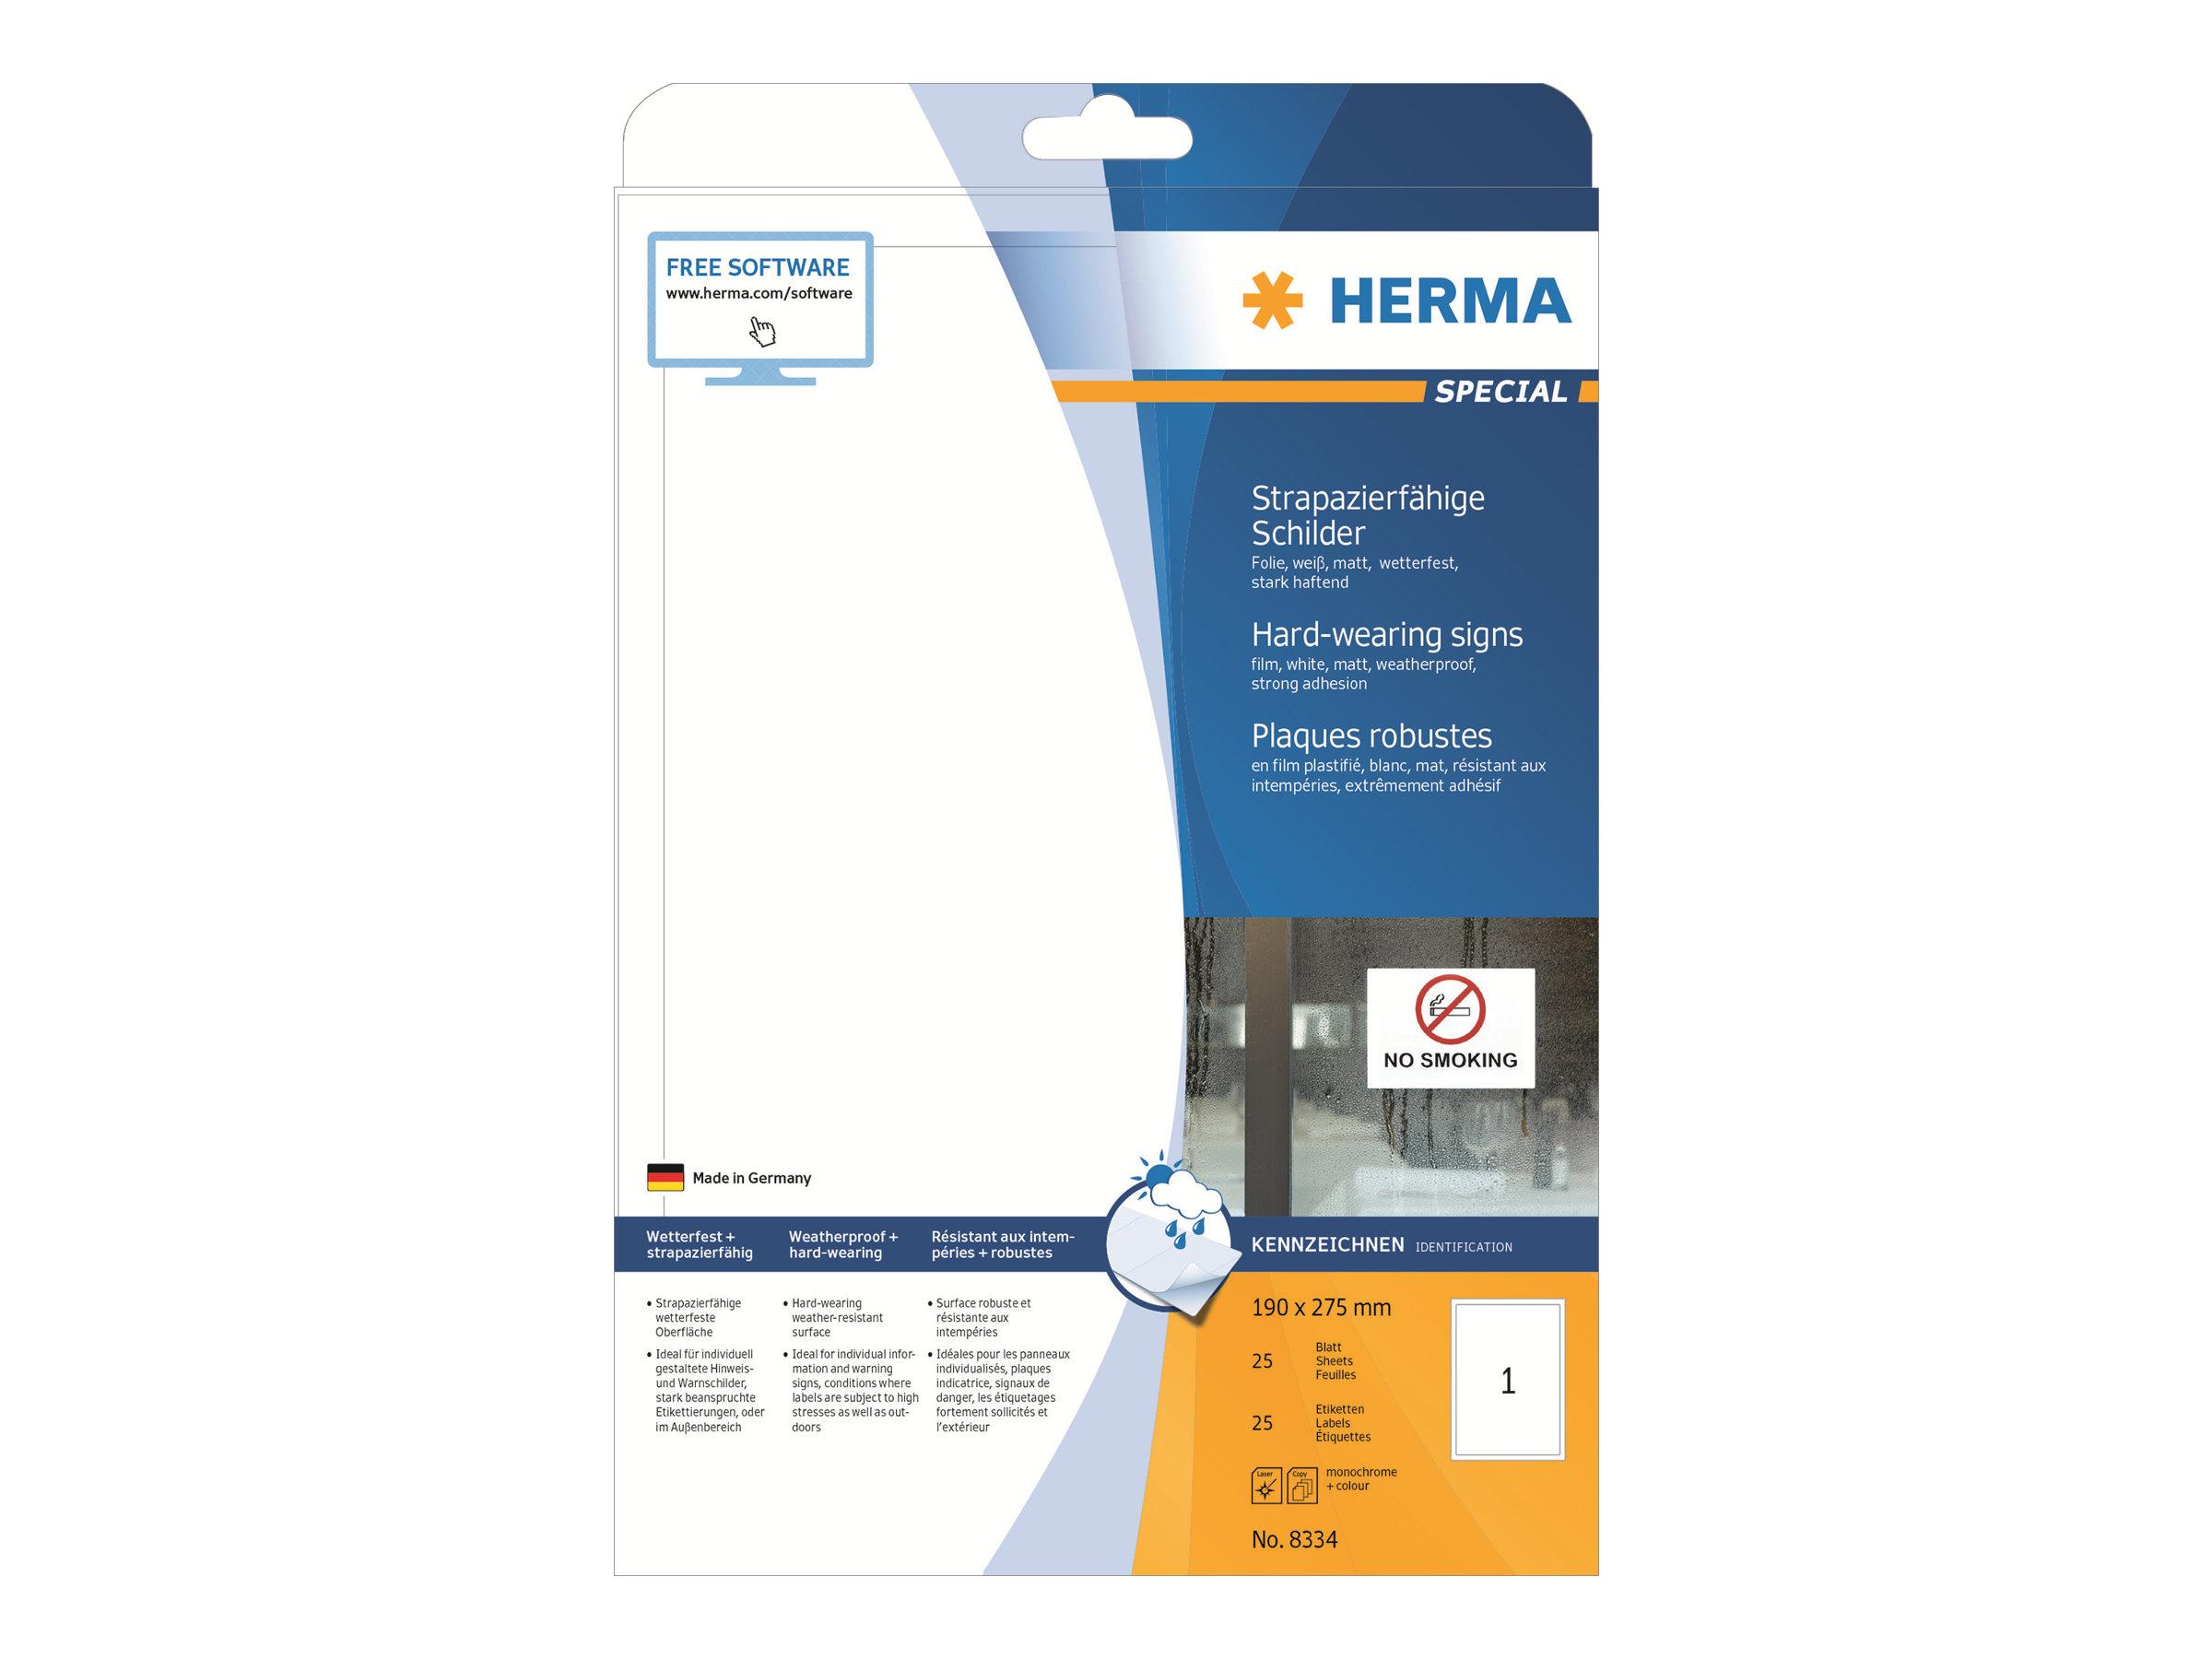 HERMA Special - Selbstklebend - weiß - 190 x 275 mm 25 Stck. (25 Bogen x 1)